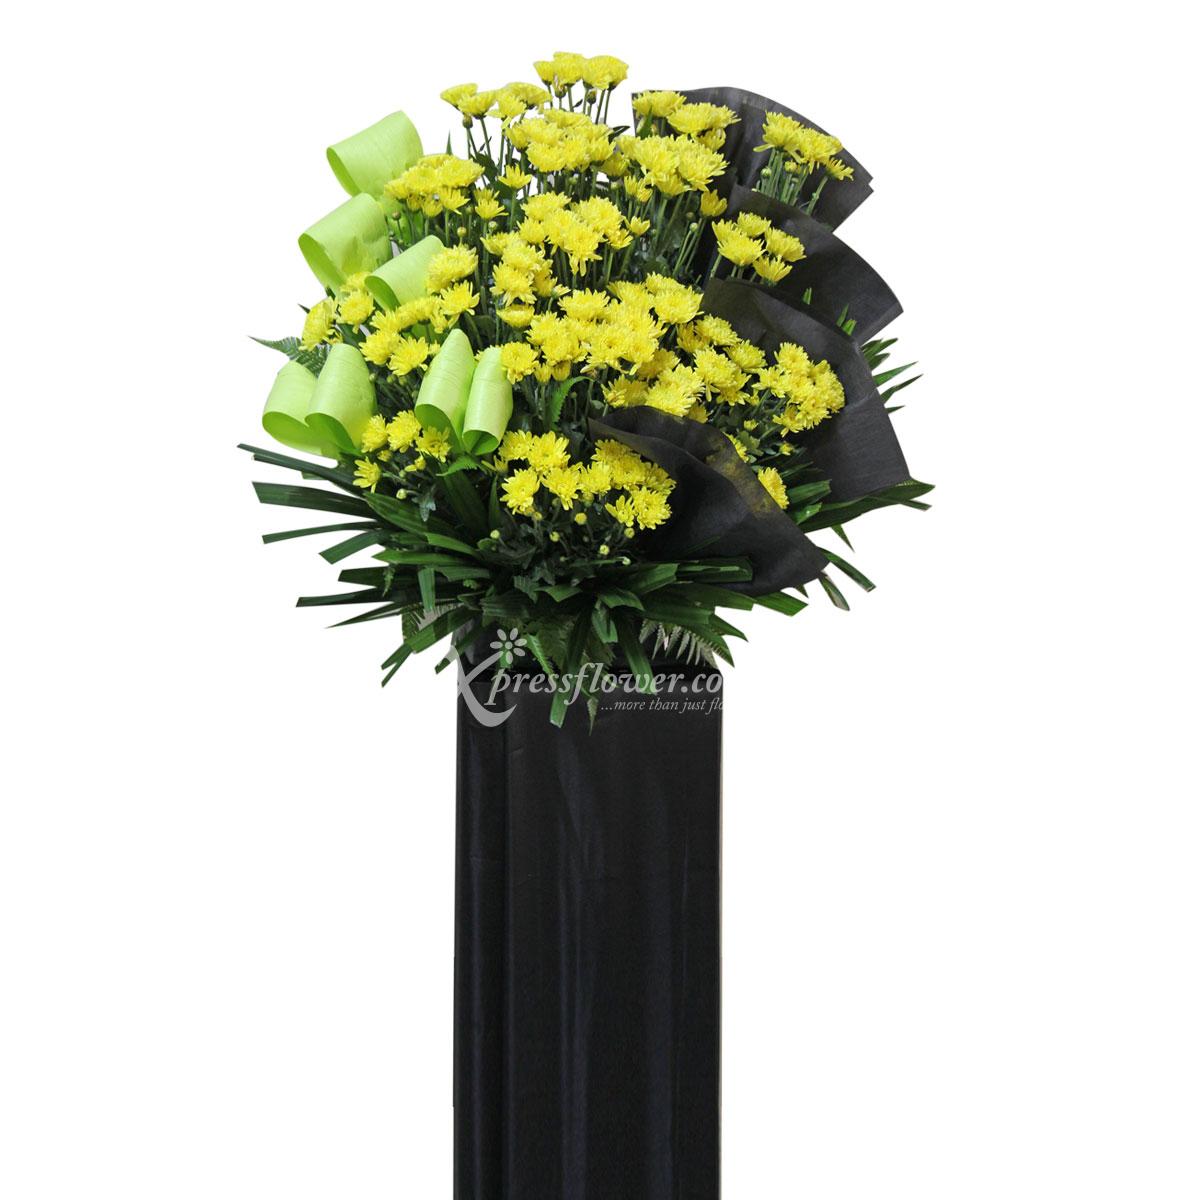 sc1714-fond-memories-condolence-flower-wreath-standsa1ba0fa9350a62b6a920ff0000e4902b